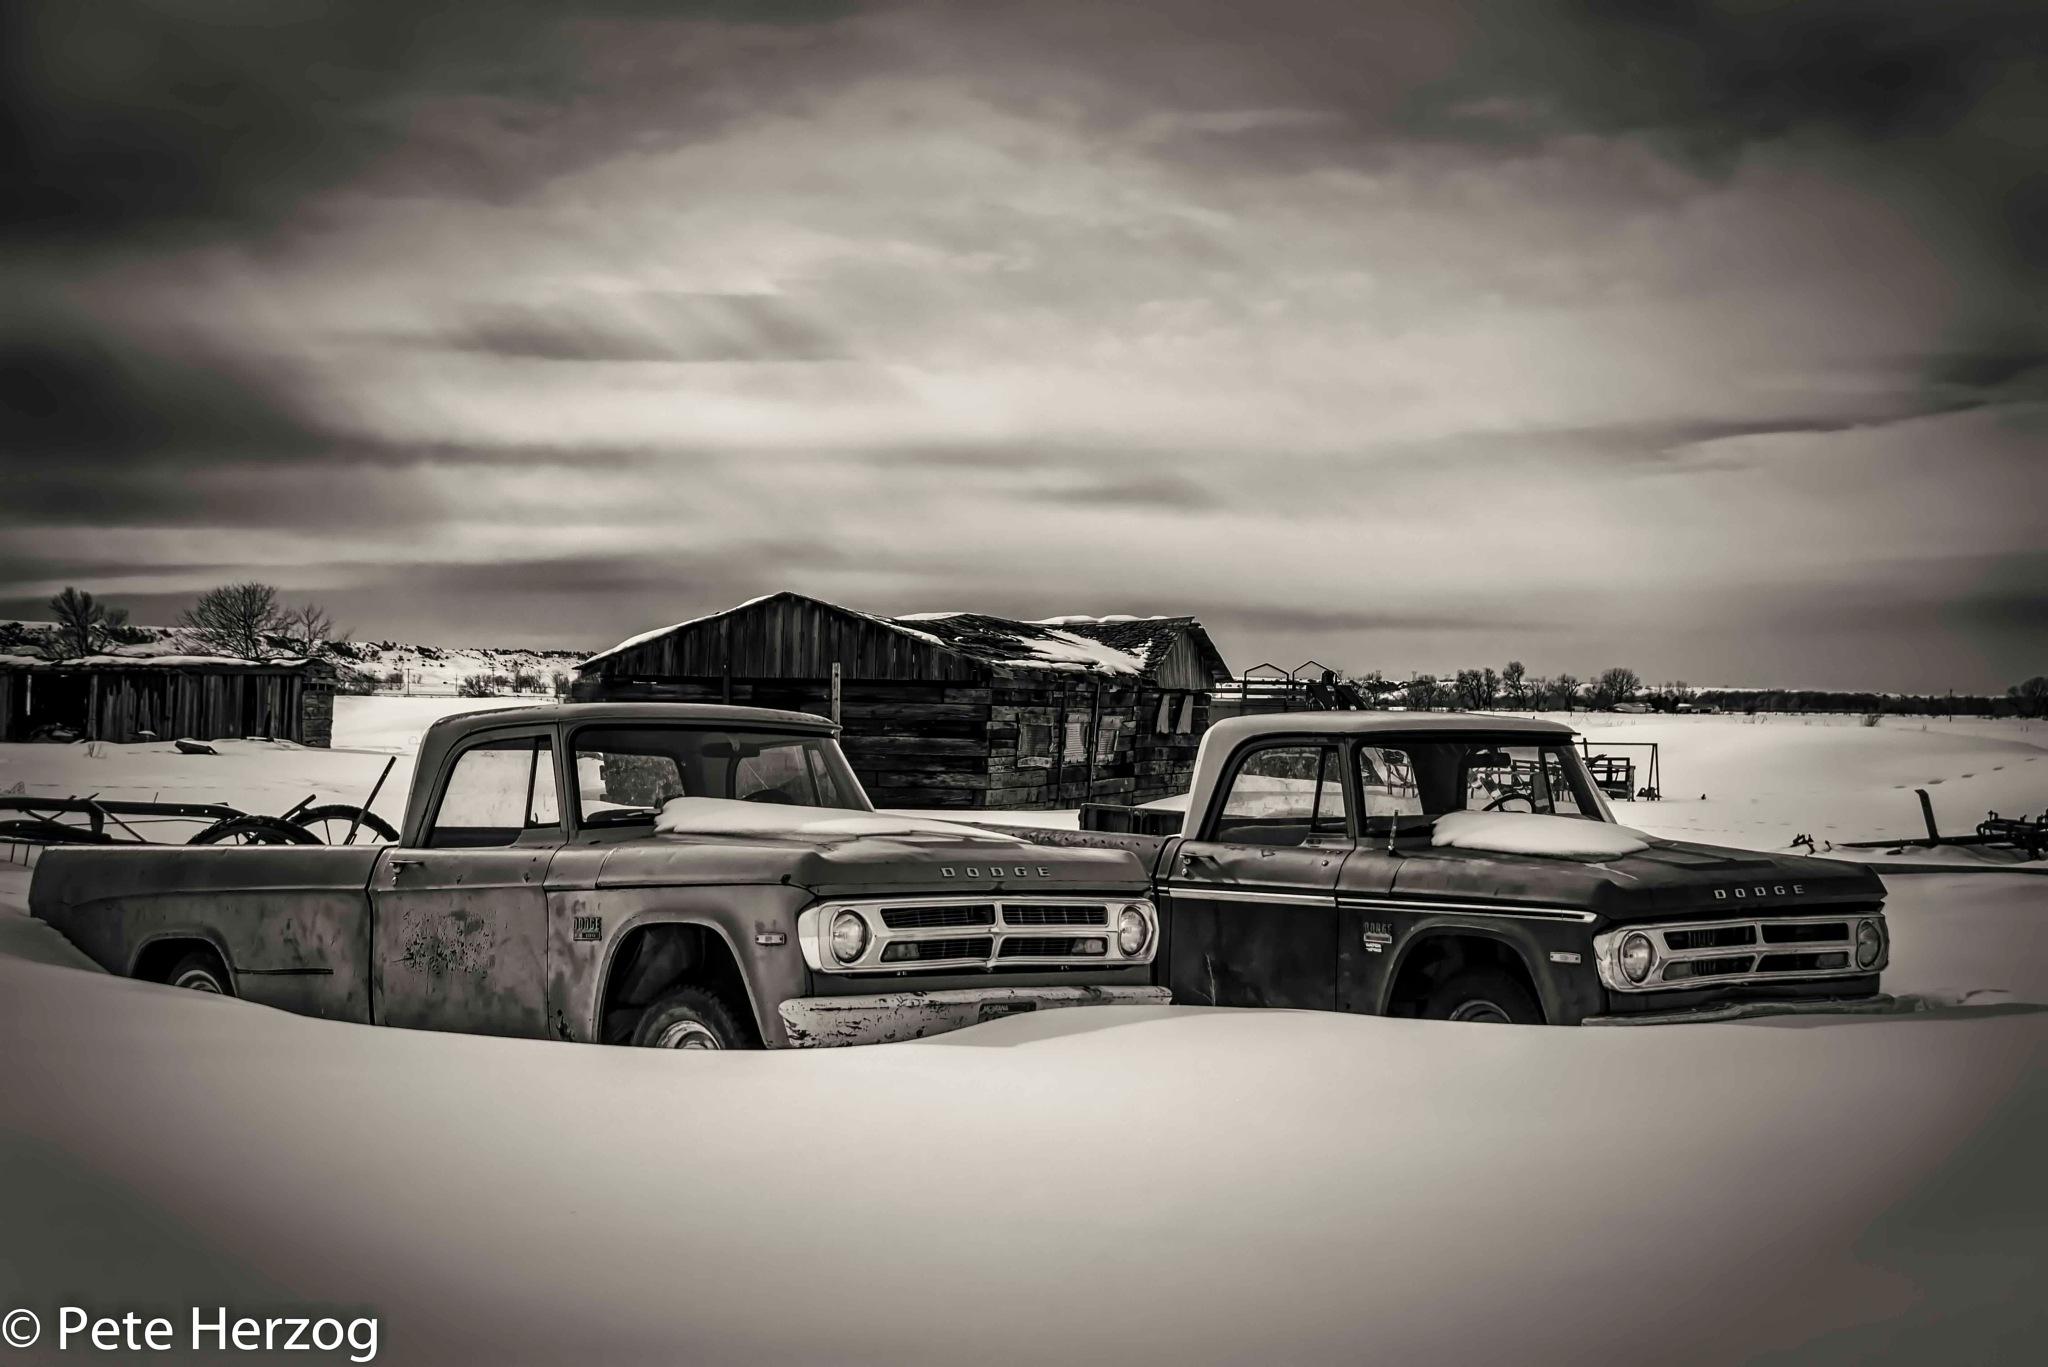 Dodge Pickups in Snow by peter.herzog.3323